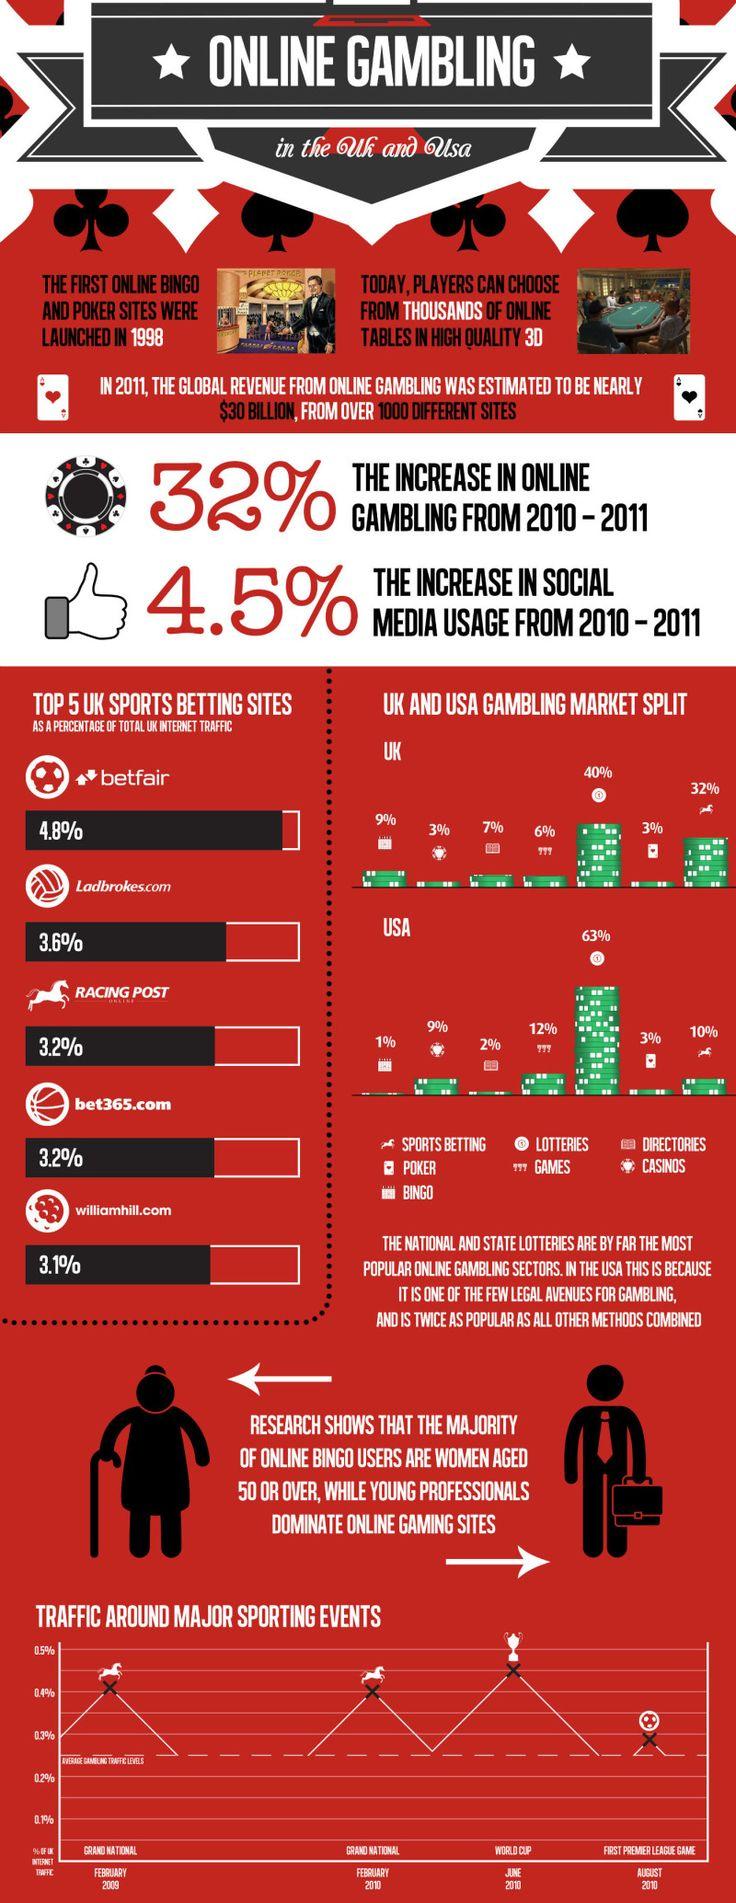 Sports Betting #sports #betting - http://wanelo.com/p/3870574/the-vegas-nightmare